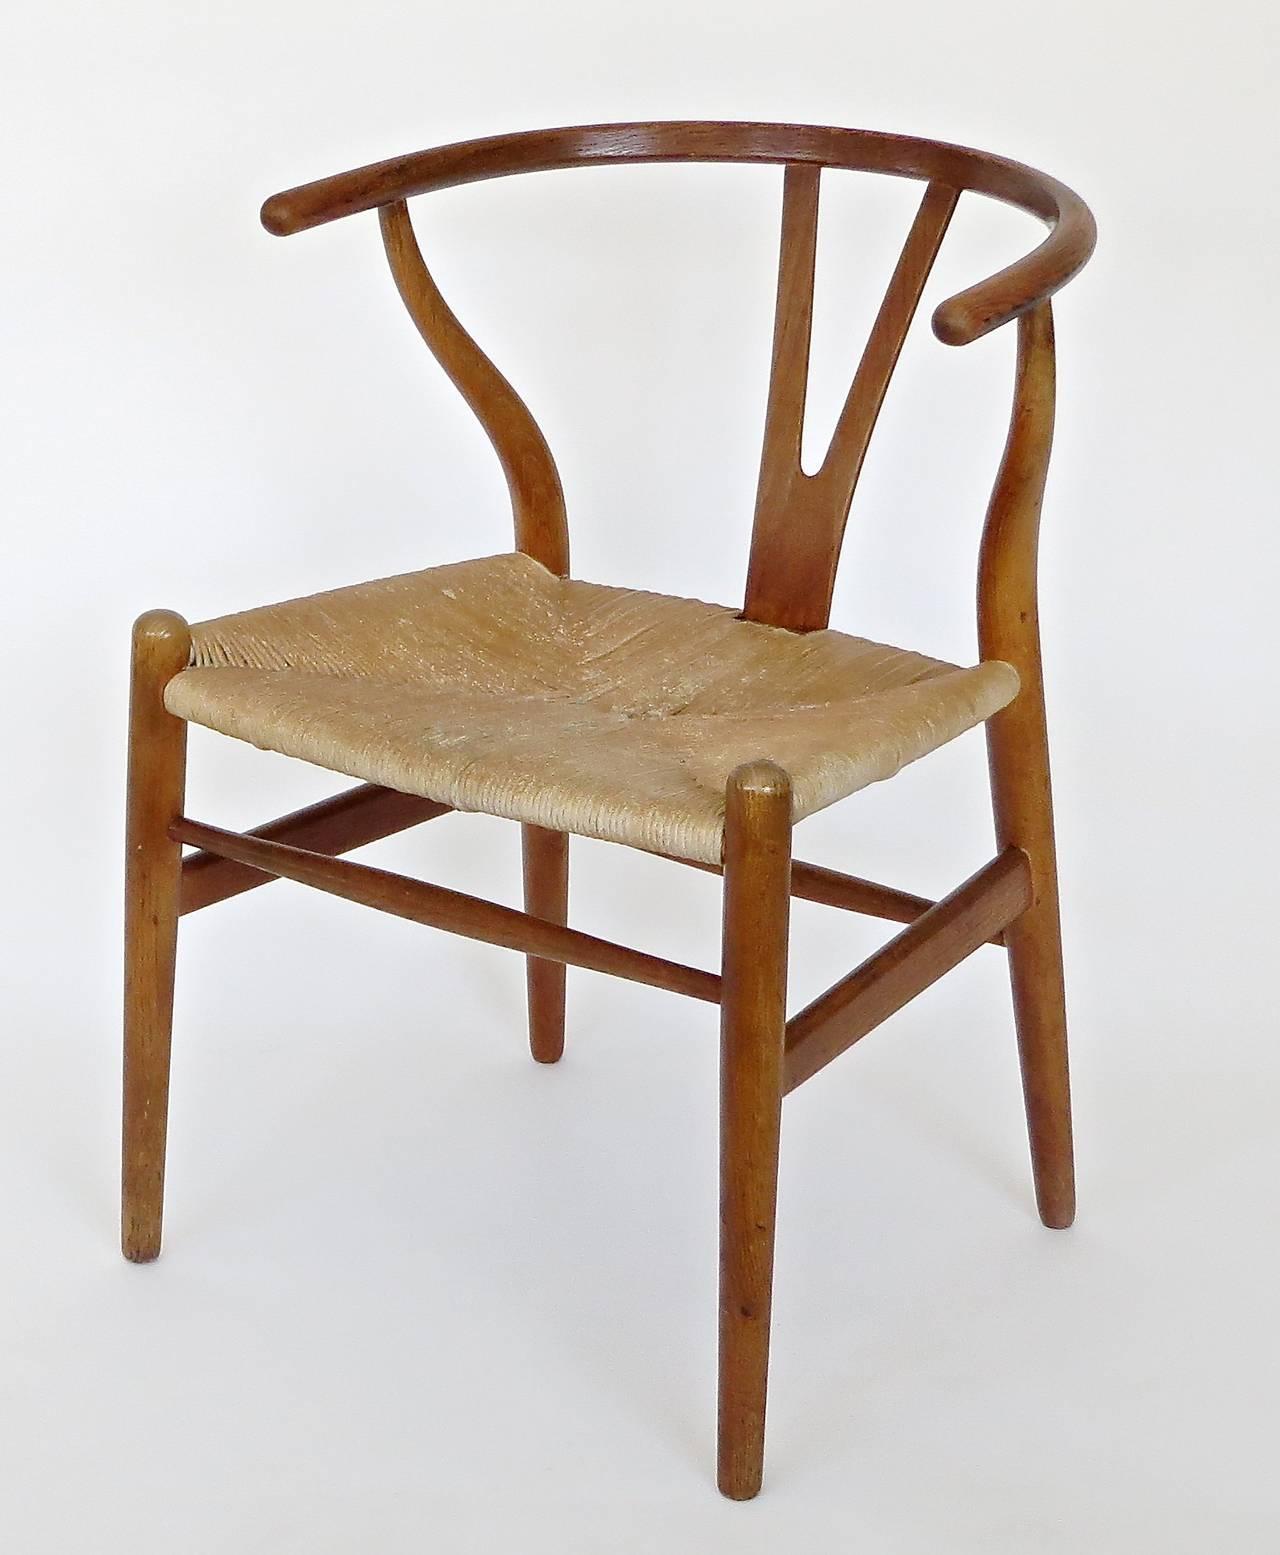 wishbone chairs baby tailgate chair danish ch 24 by hans wegner at 1stdibs